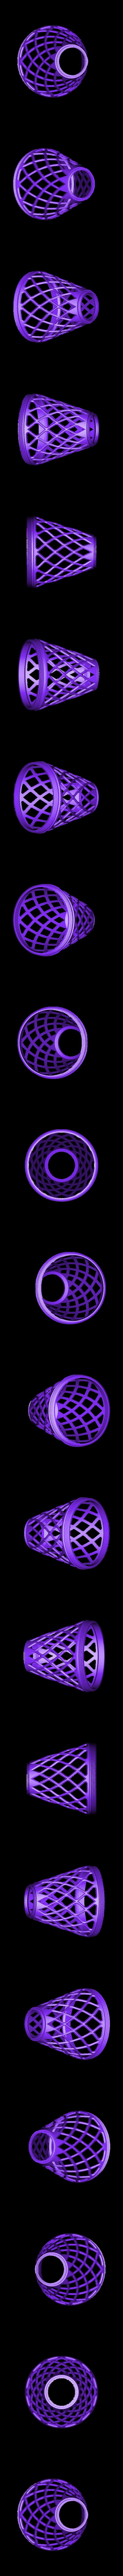 Corps-Principal.stl Download STL file Bi-Colour Suspension • 3D print object, ADL